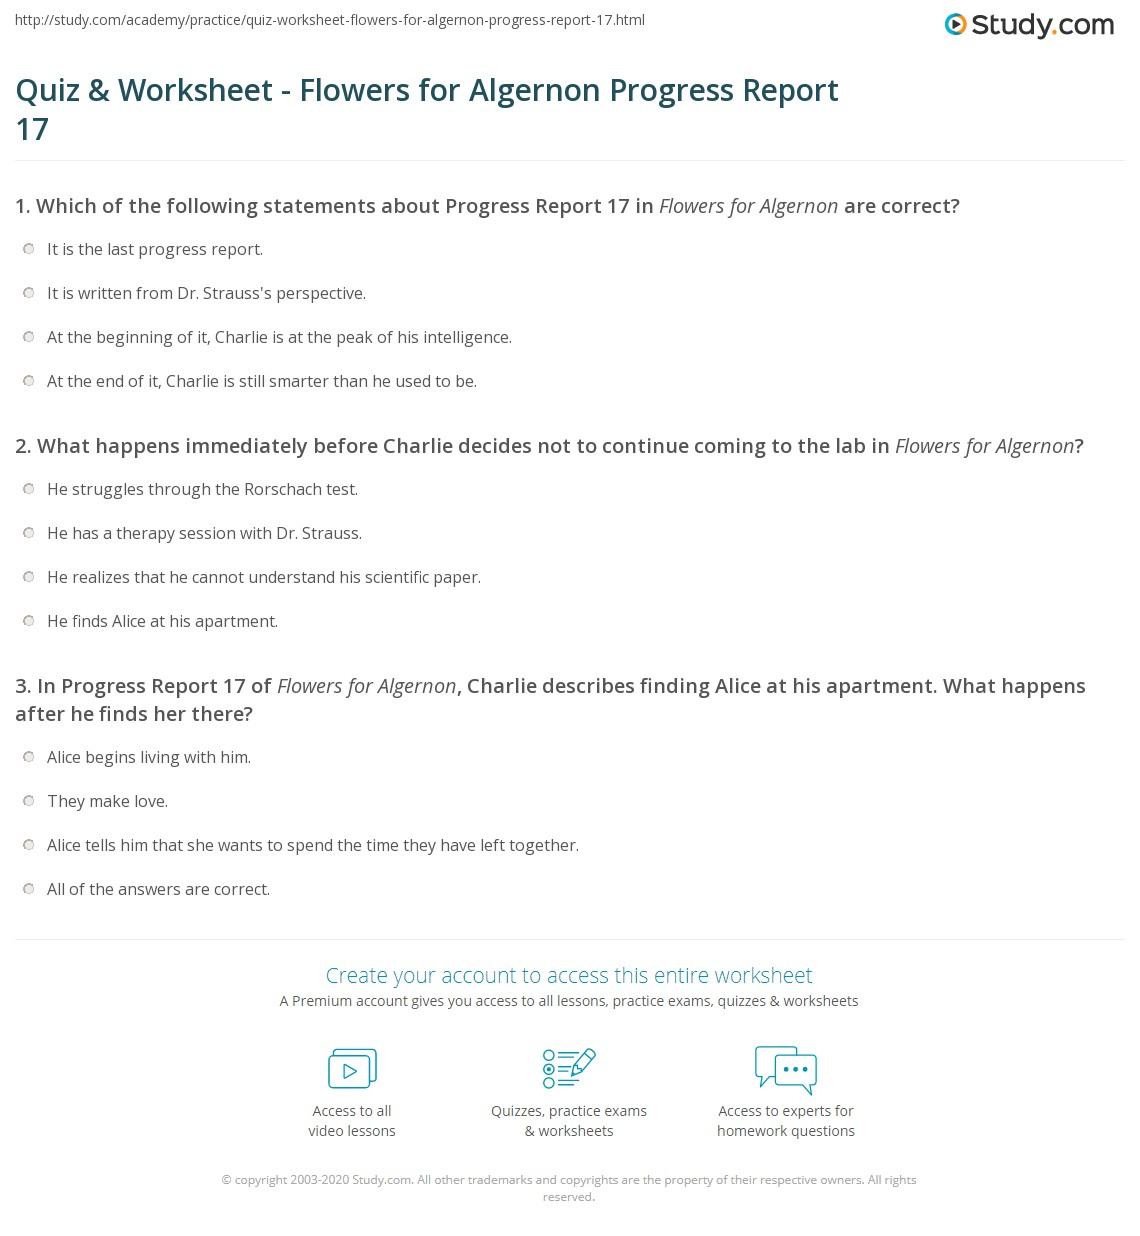 quiz worksheet flowers for algernon progress report com print flowers for algernon progress report 17 summary worksheet